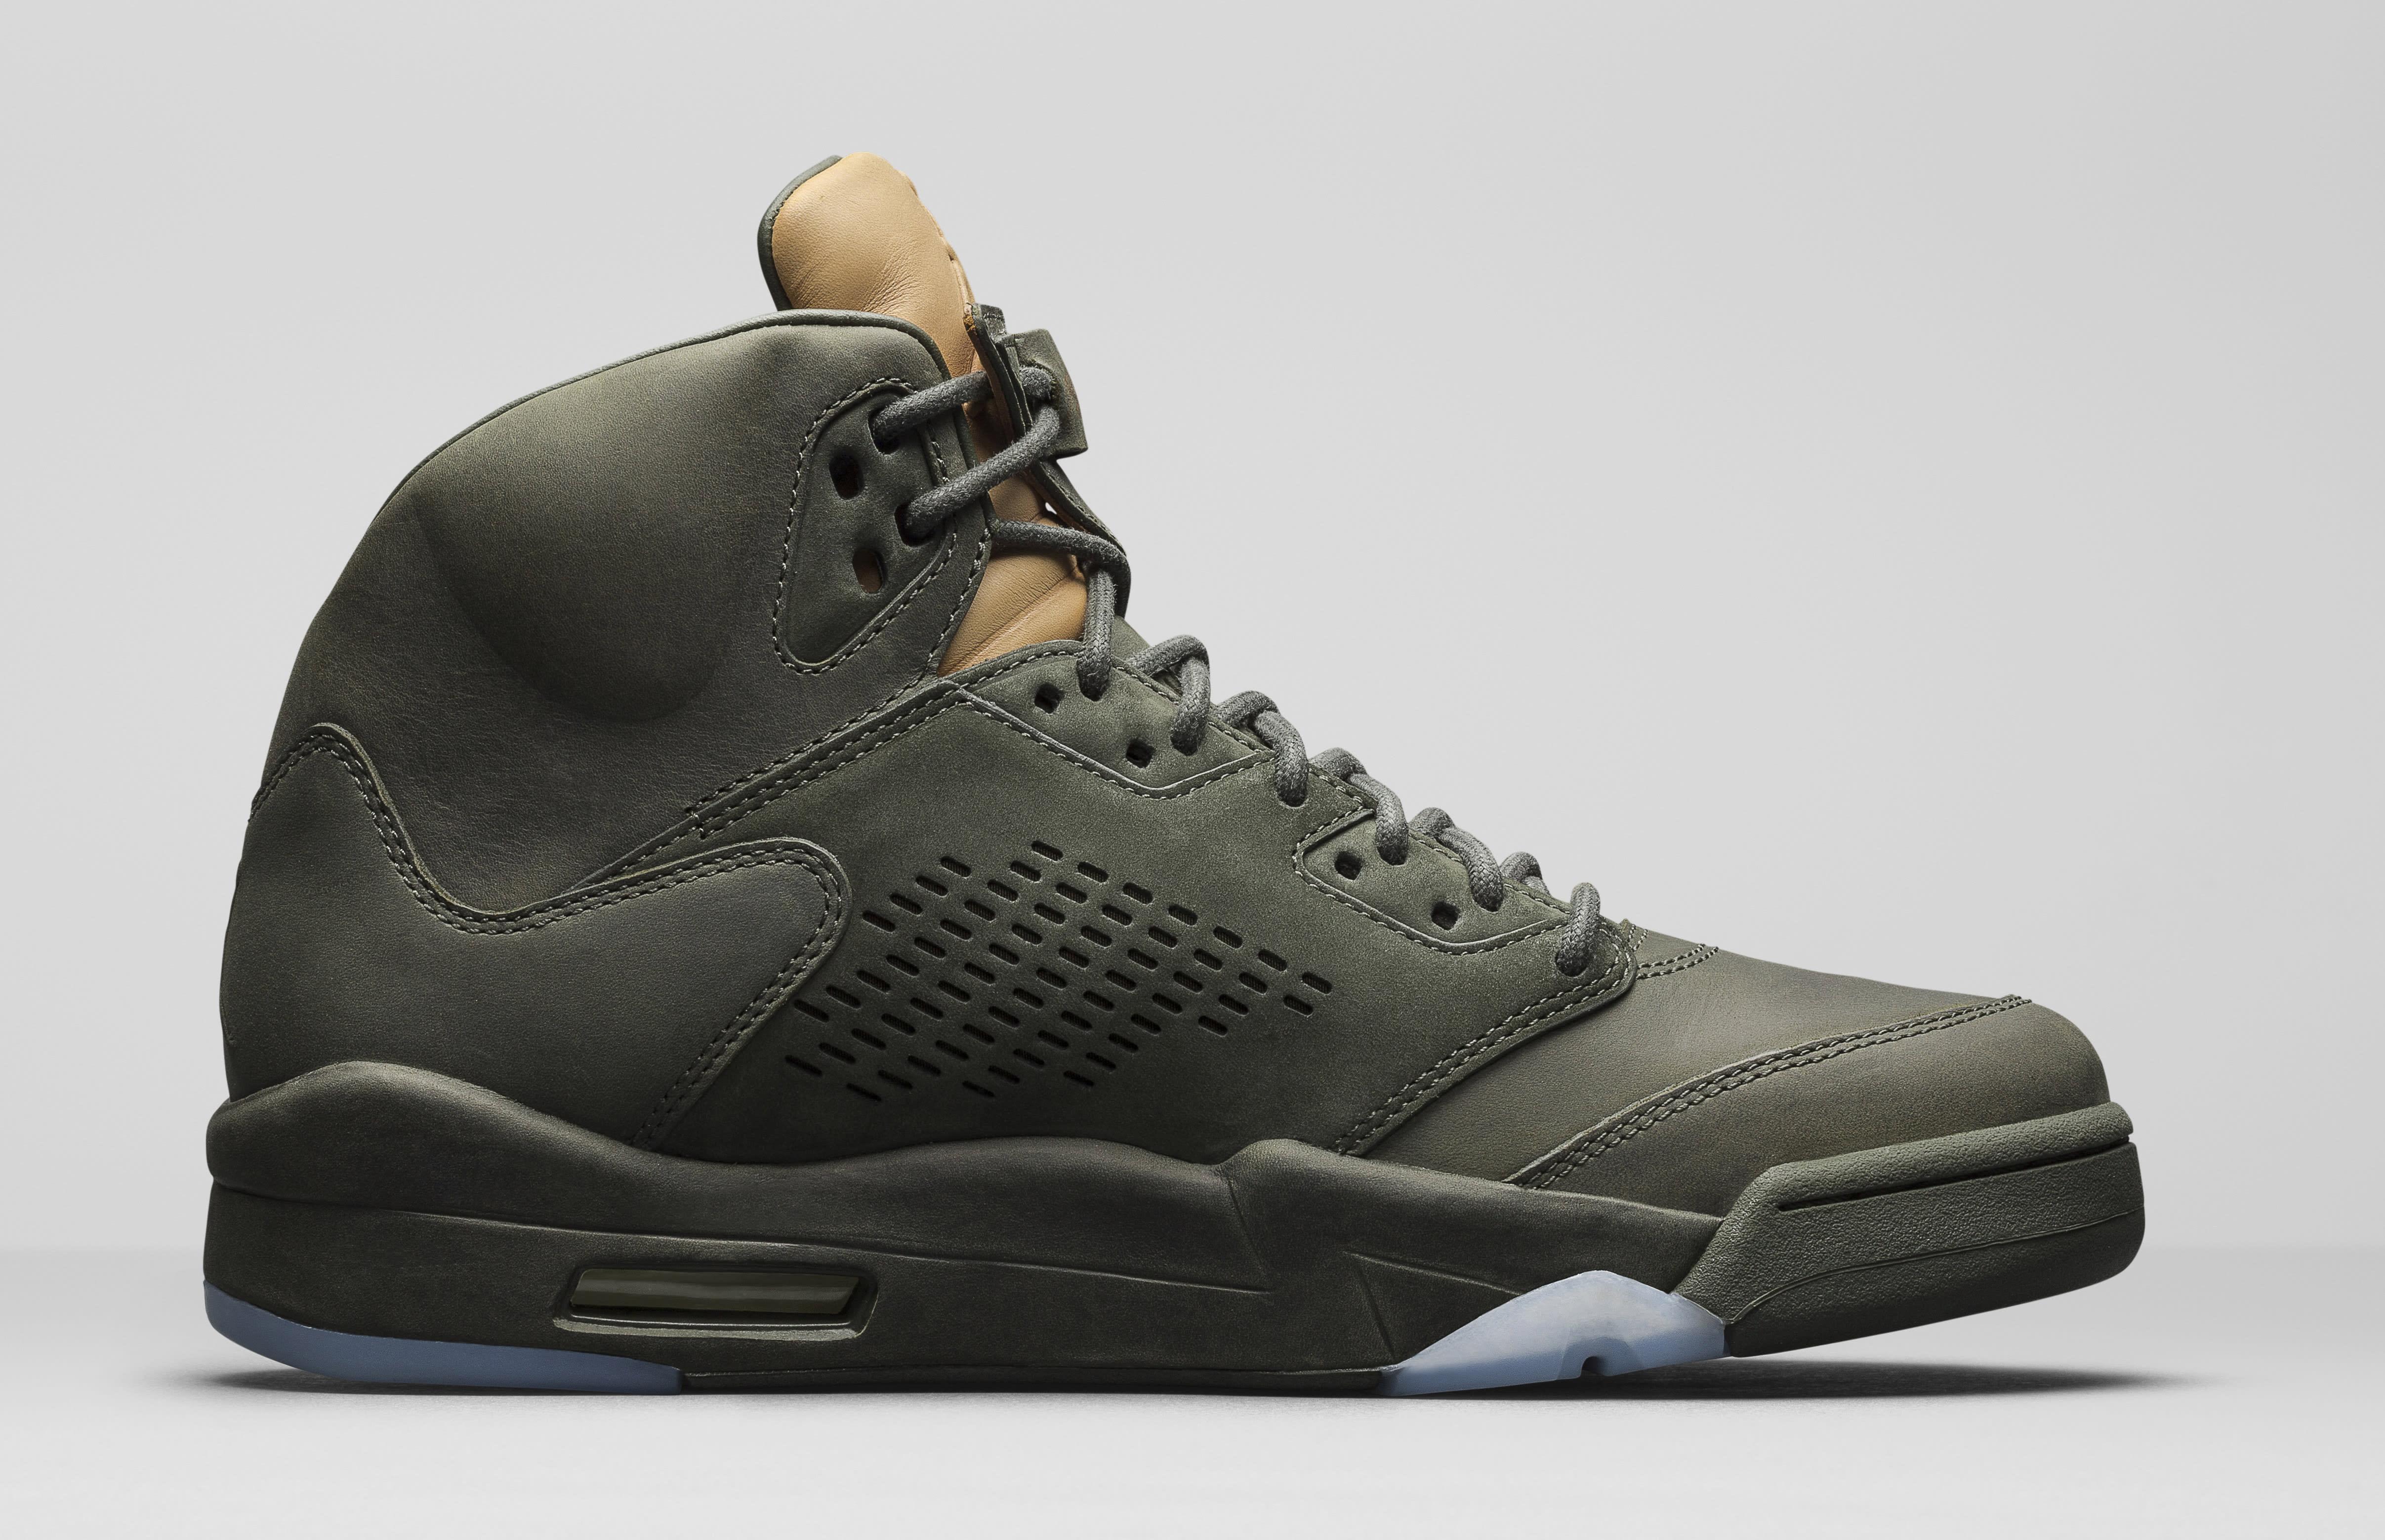 Nike Air New York Jordan 5 Retro PREM V Premium Take Flight Men Sequoia AJ5 881432-305